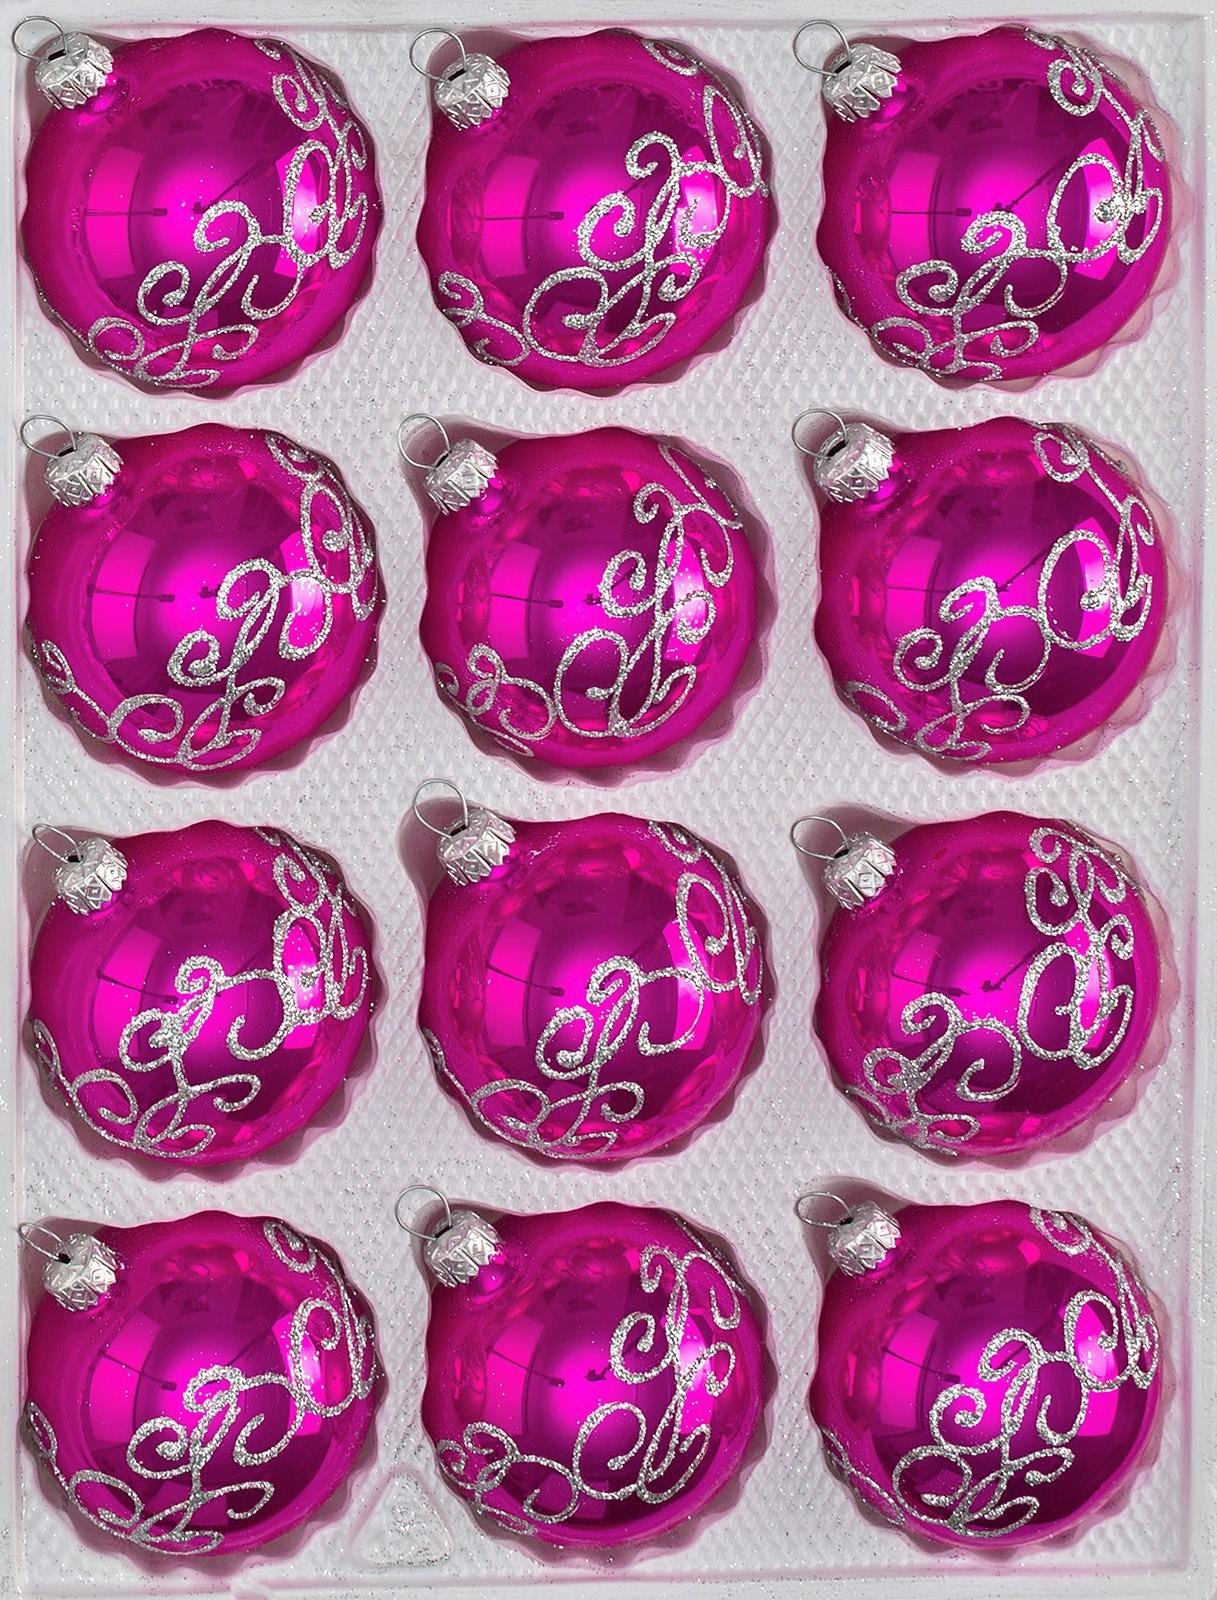 12 tlg glas weihnachtskugeln set in hochglanz pink. Black Bedroom Furniture Sets. Home Design Ideas